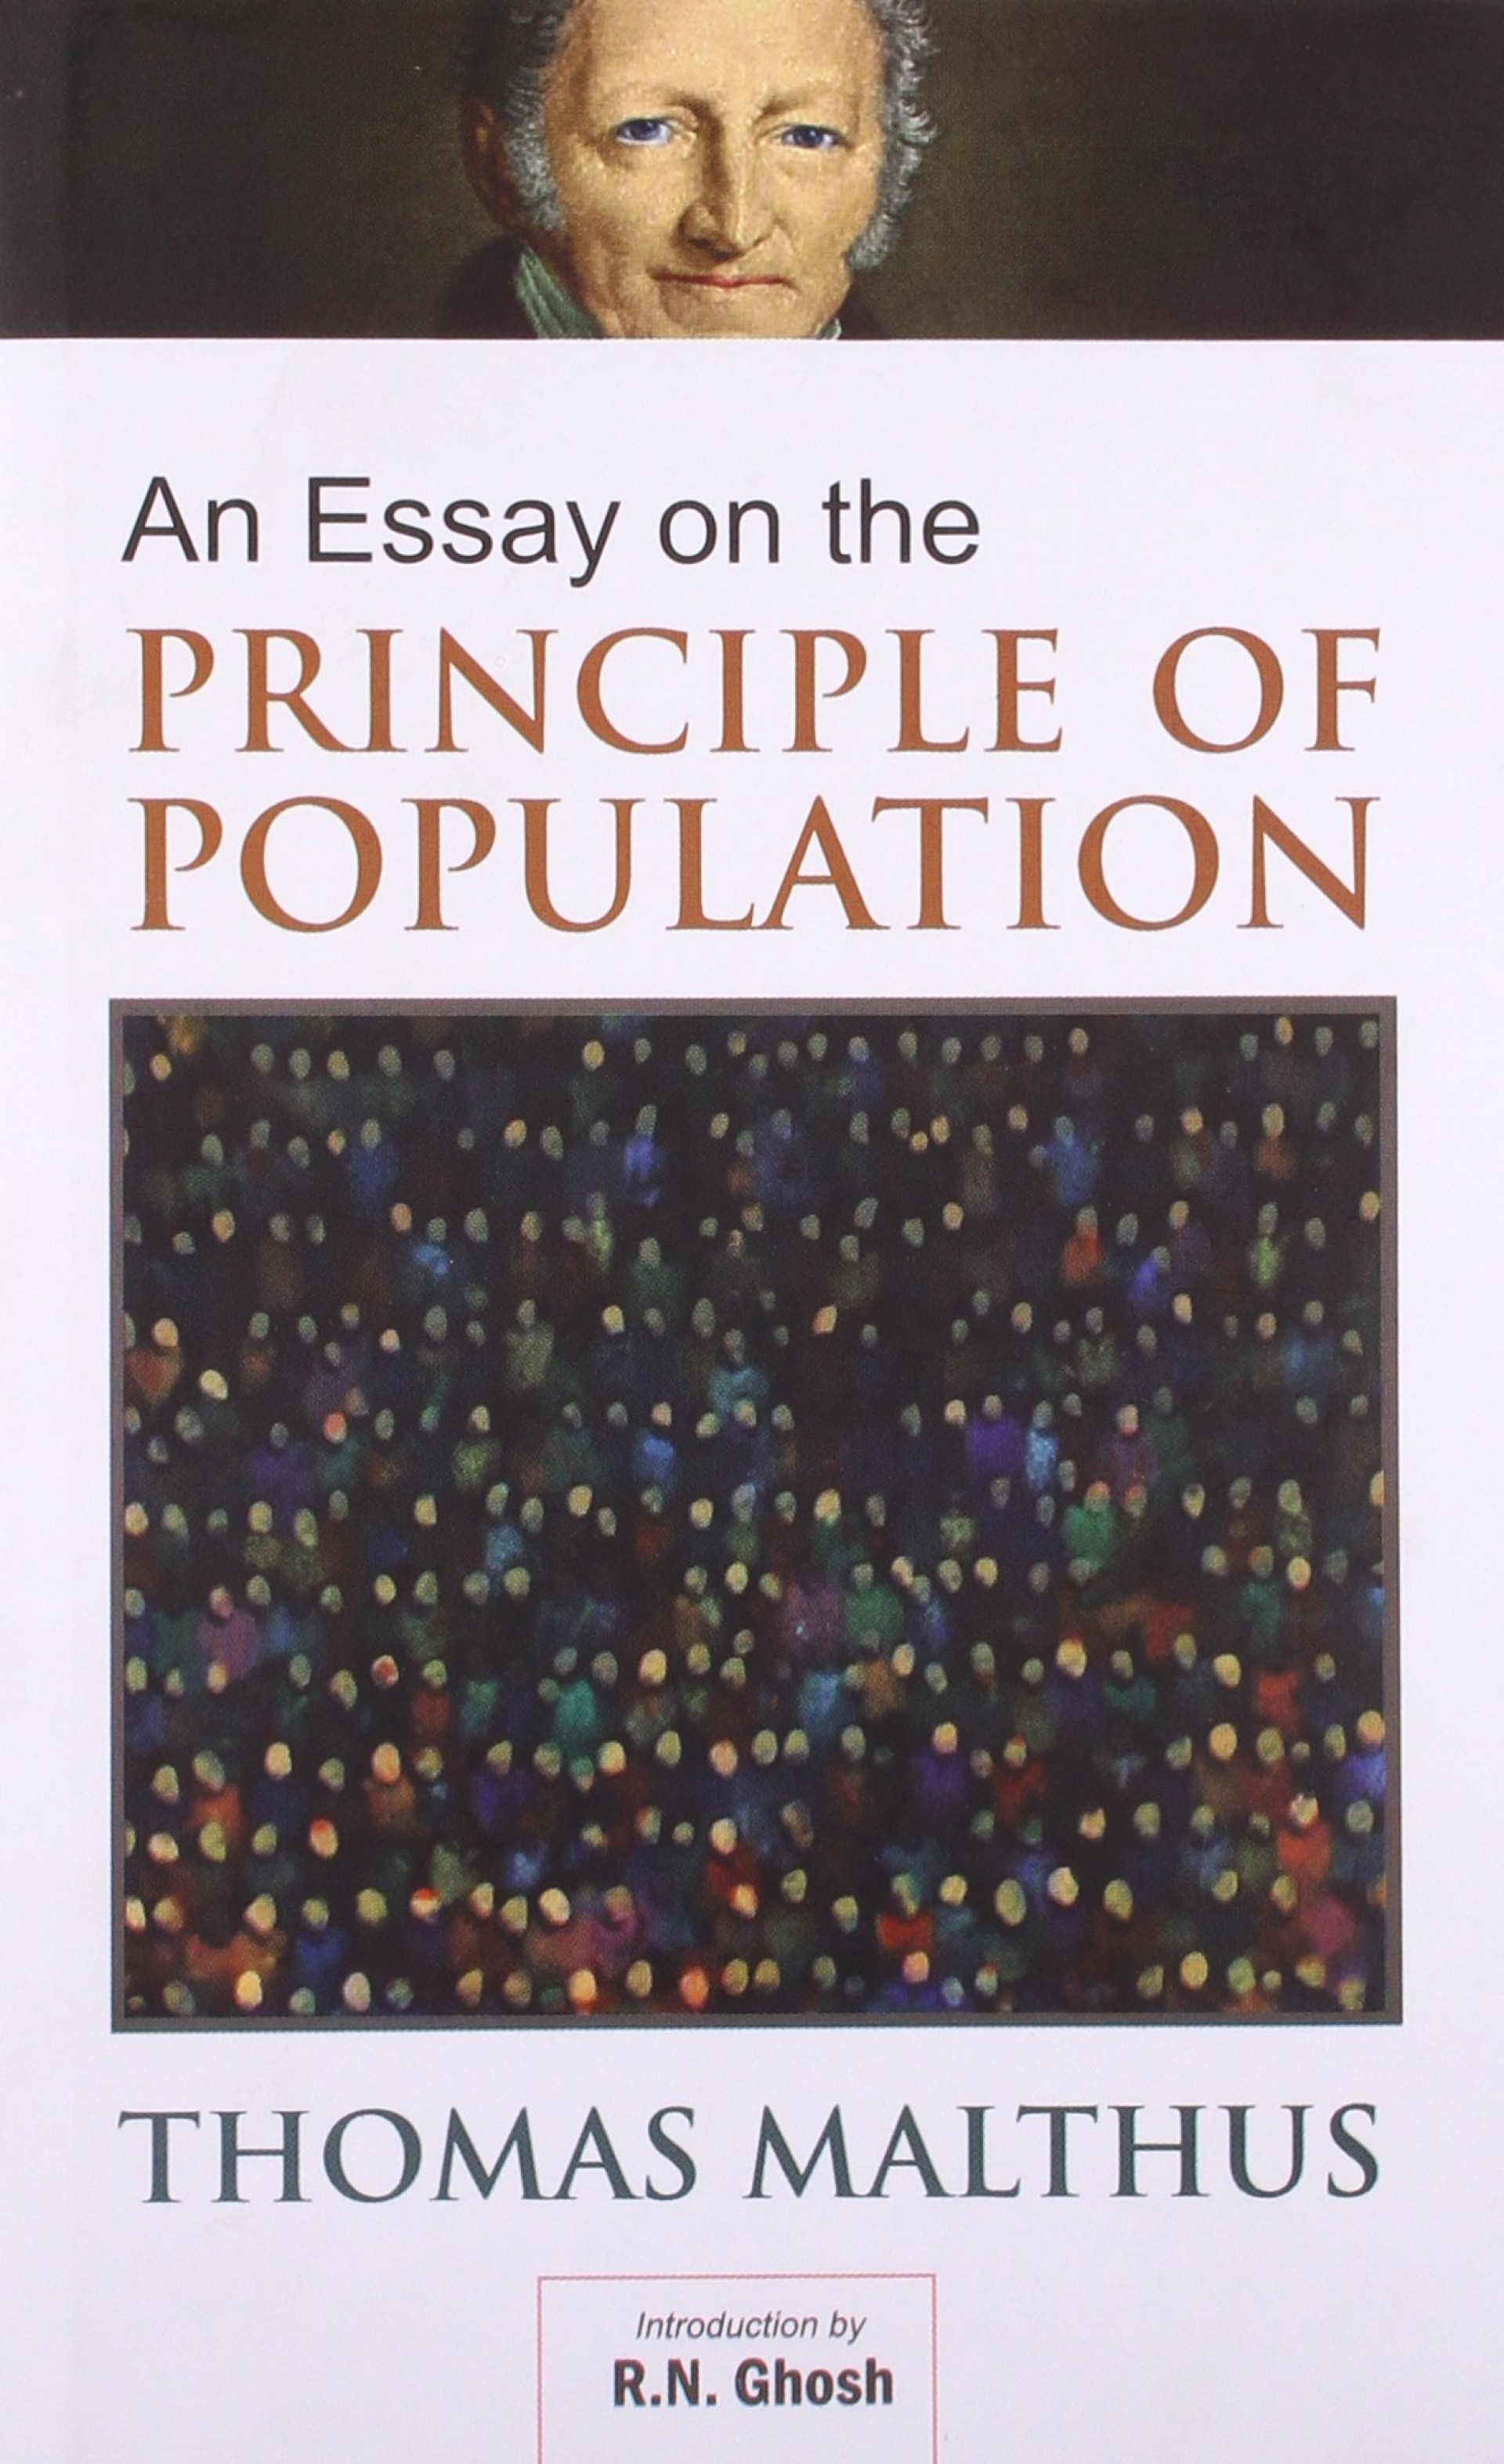 010 Thomas Malthus Essay On The Principle Of Population 8162bfm1ycfl Stupendous After Reading Malthus's Principles Darwin Got Idea That Ap Euro 1920